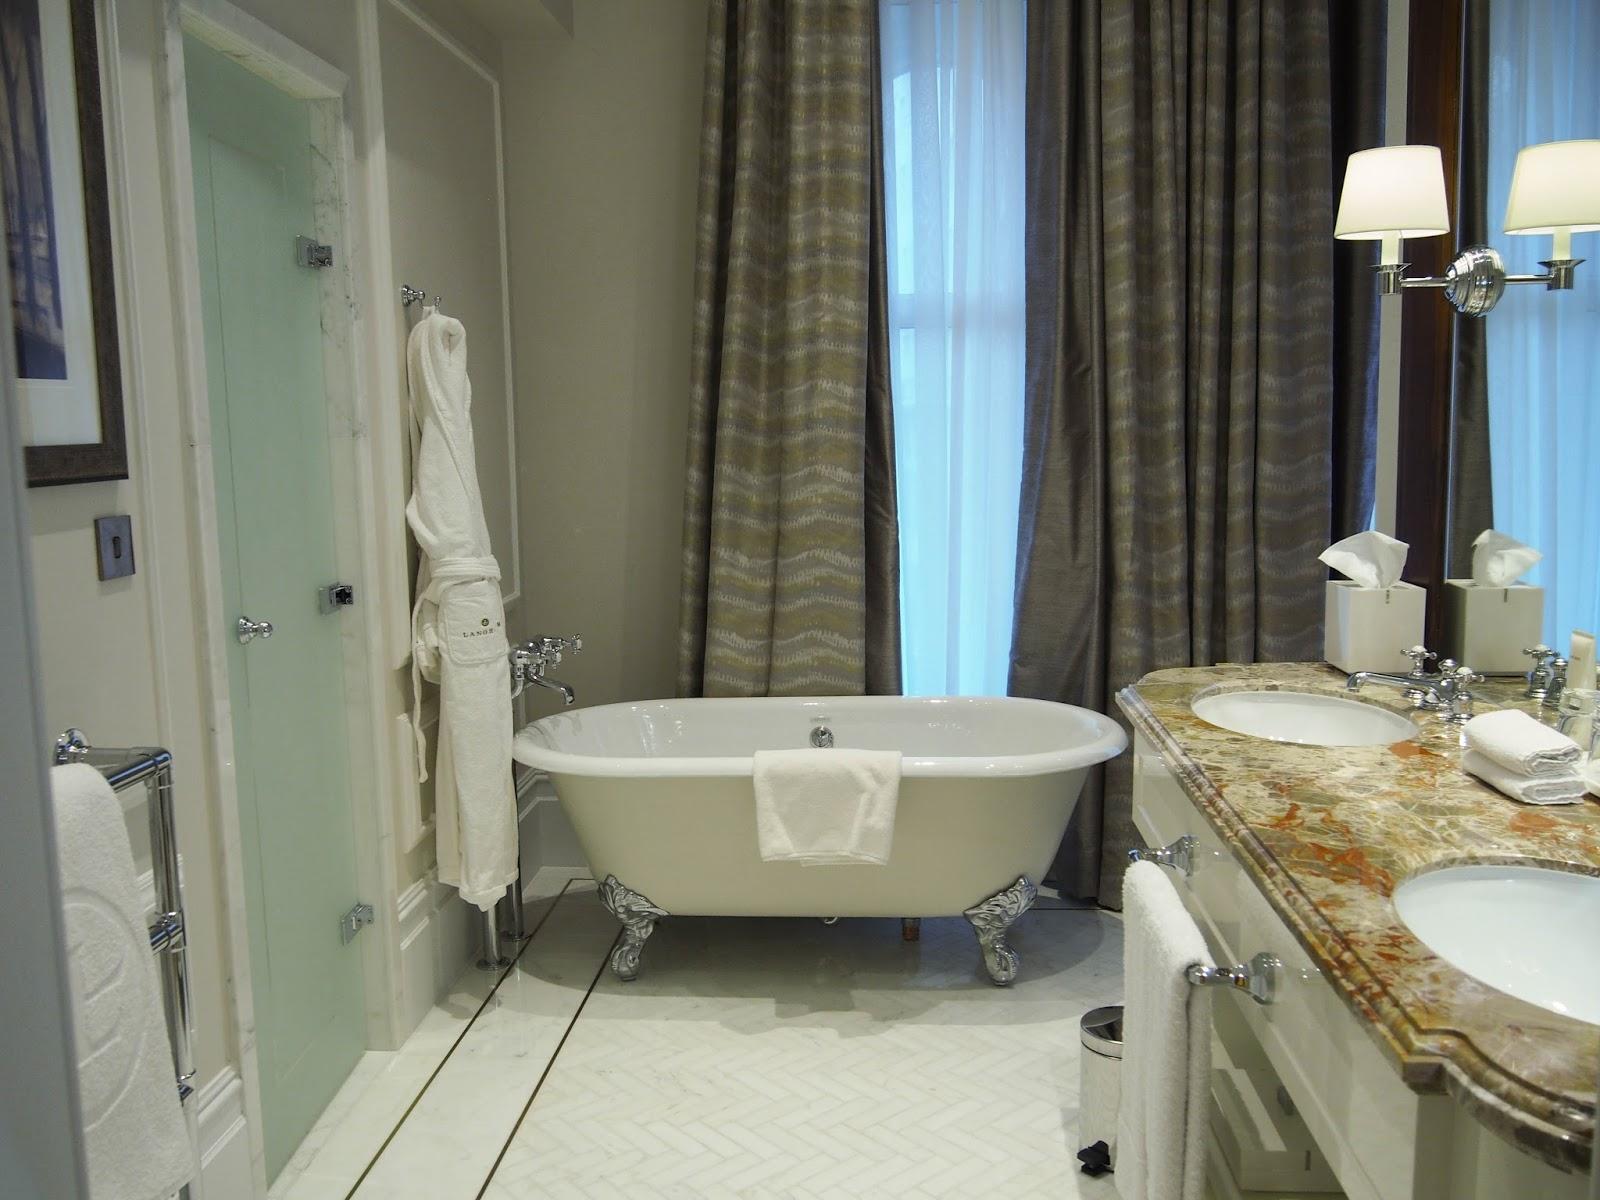 Luxury Hotel Stay Langham Hotel Marylebone Adventures of a London Kiwi